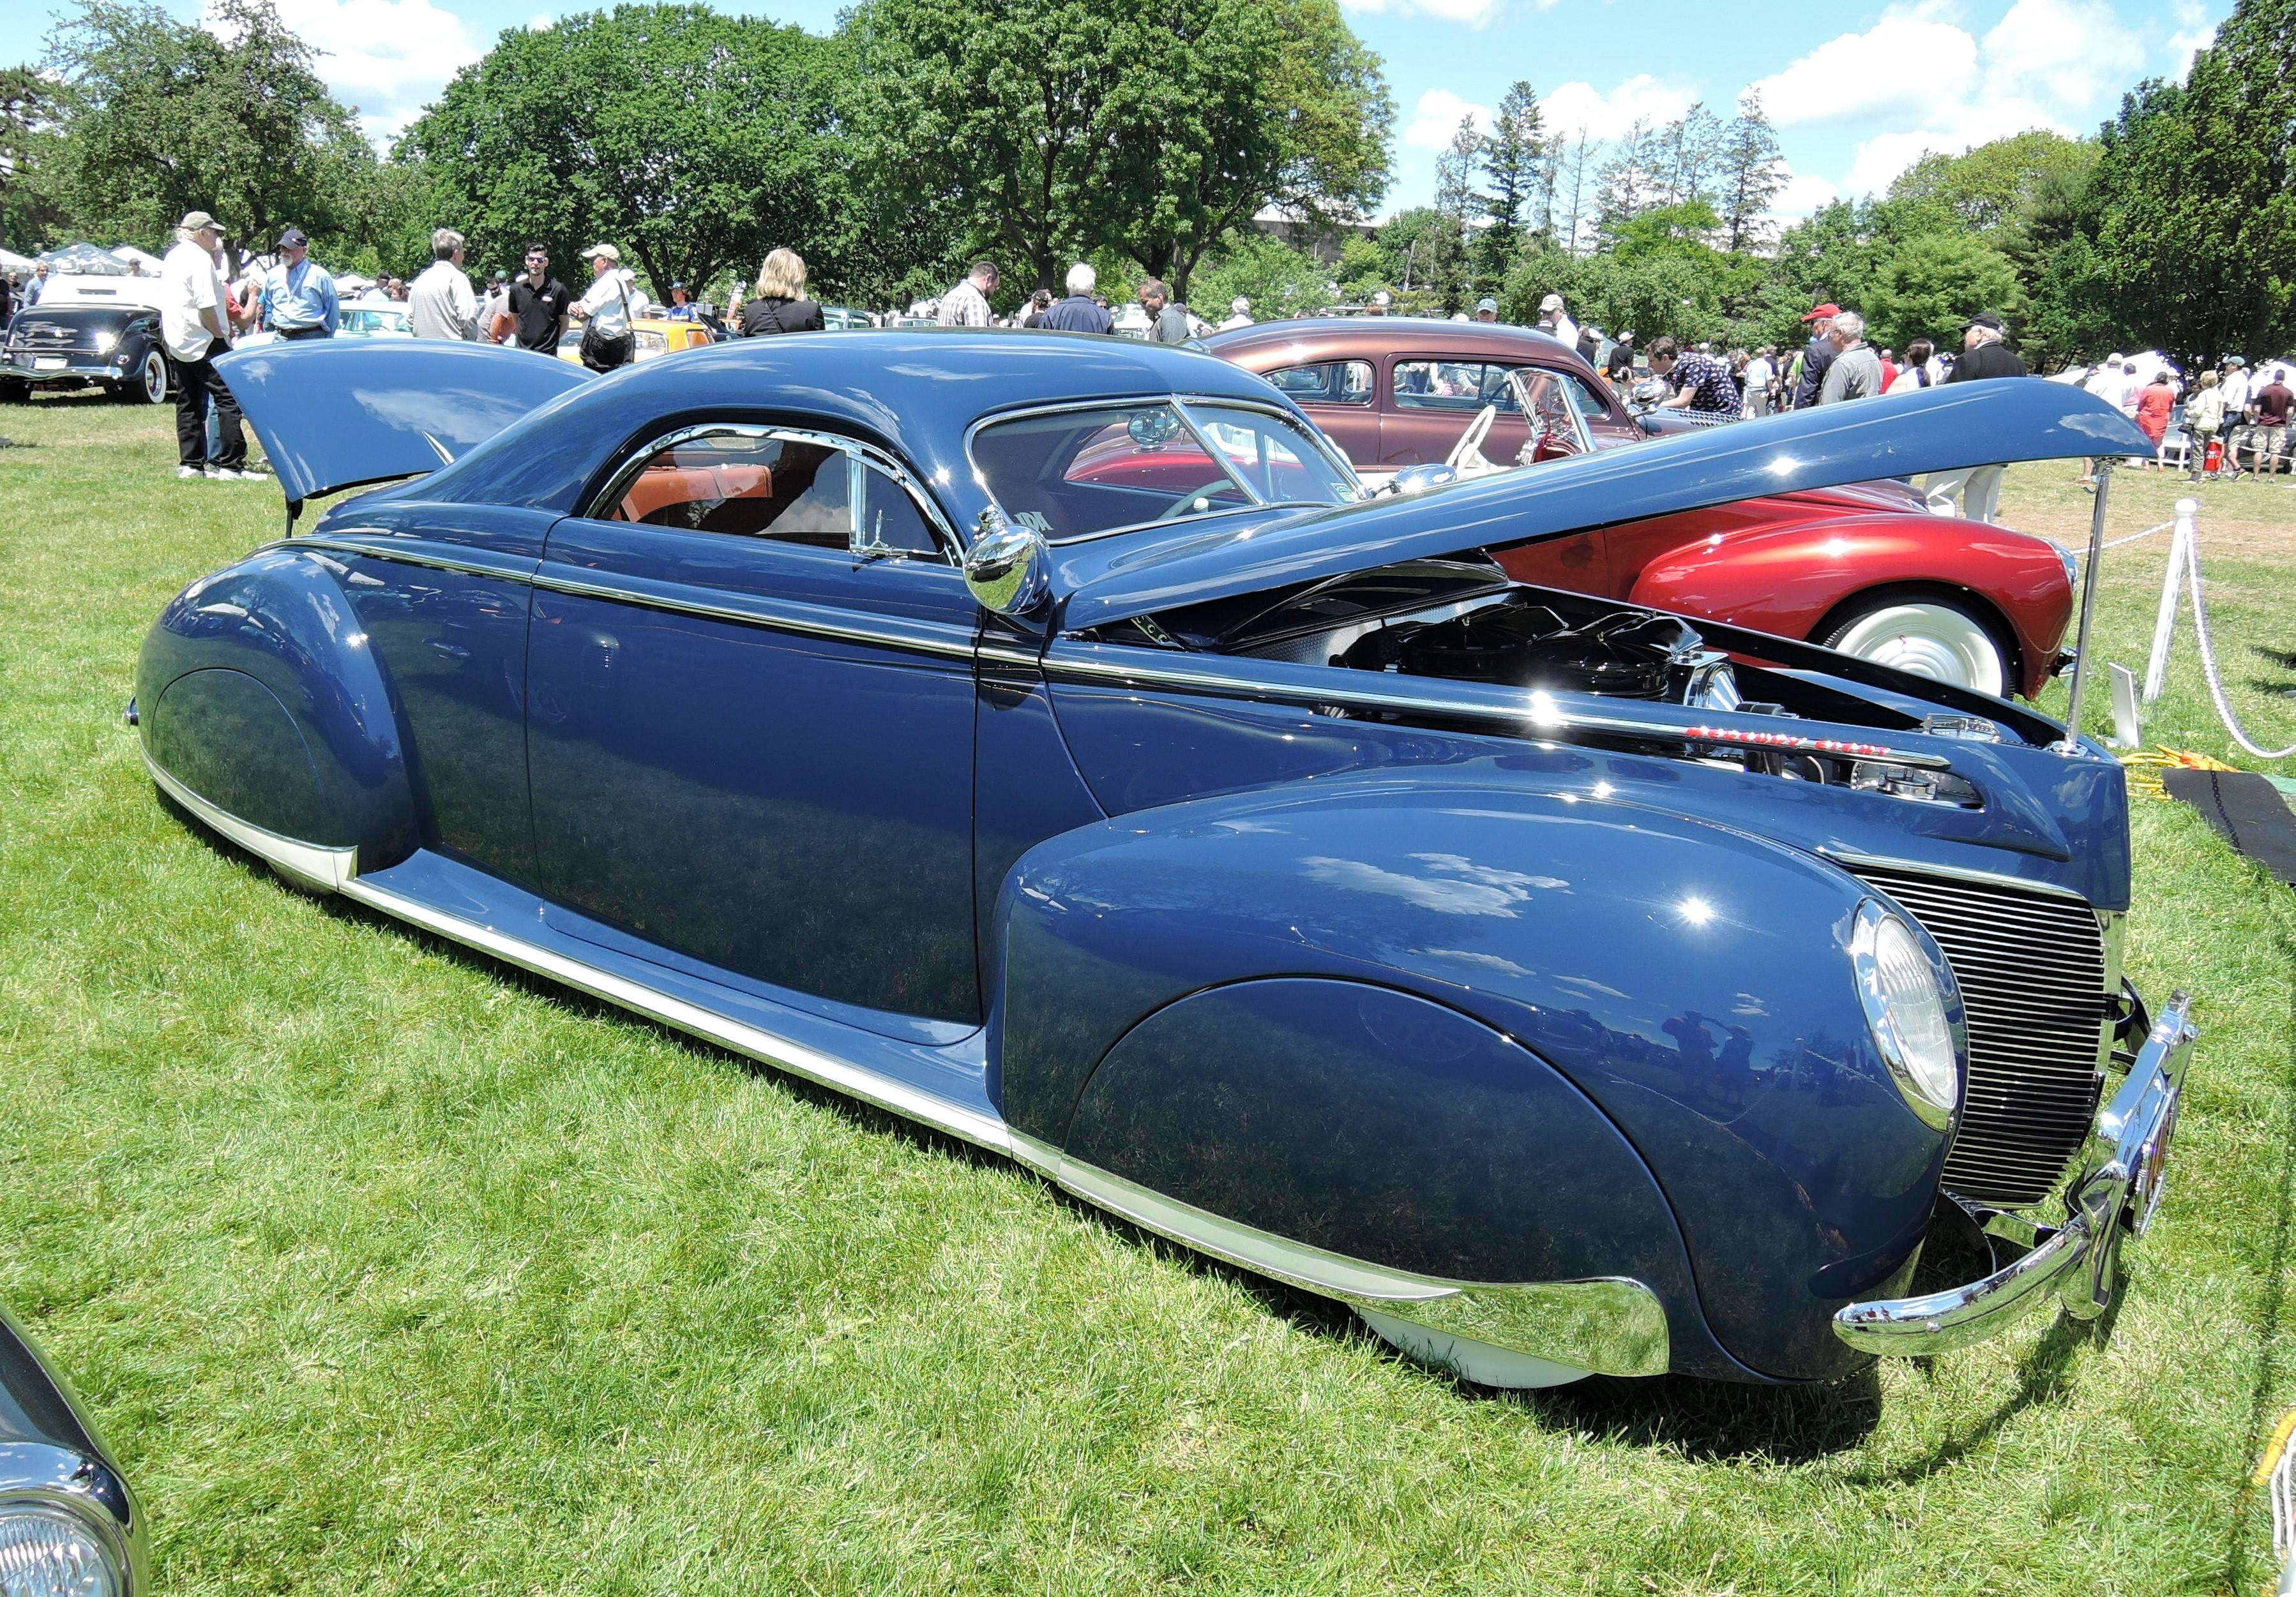 blue 1940 Mercury Sport by Ida Automotive - Greenwich Concours d'Elegance 2017